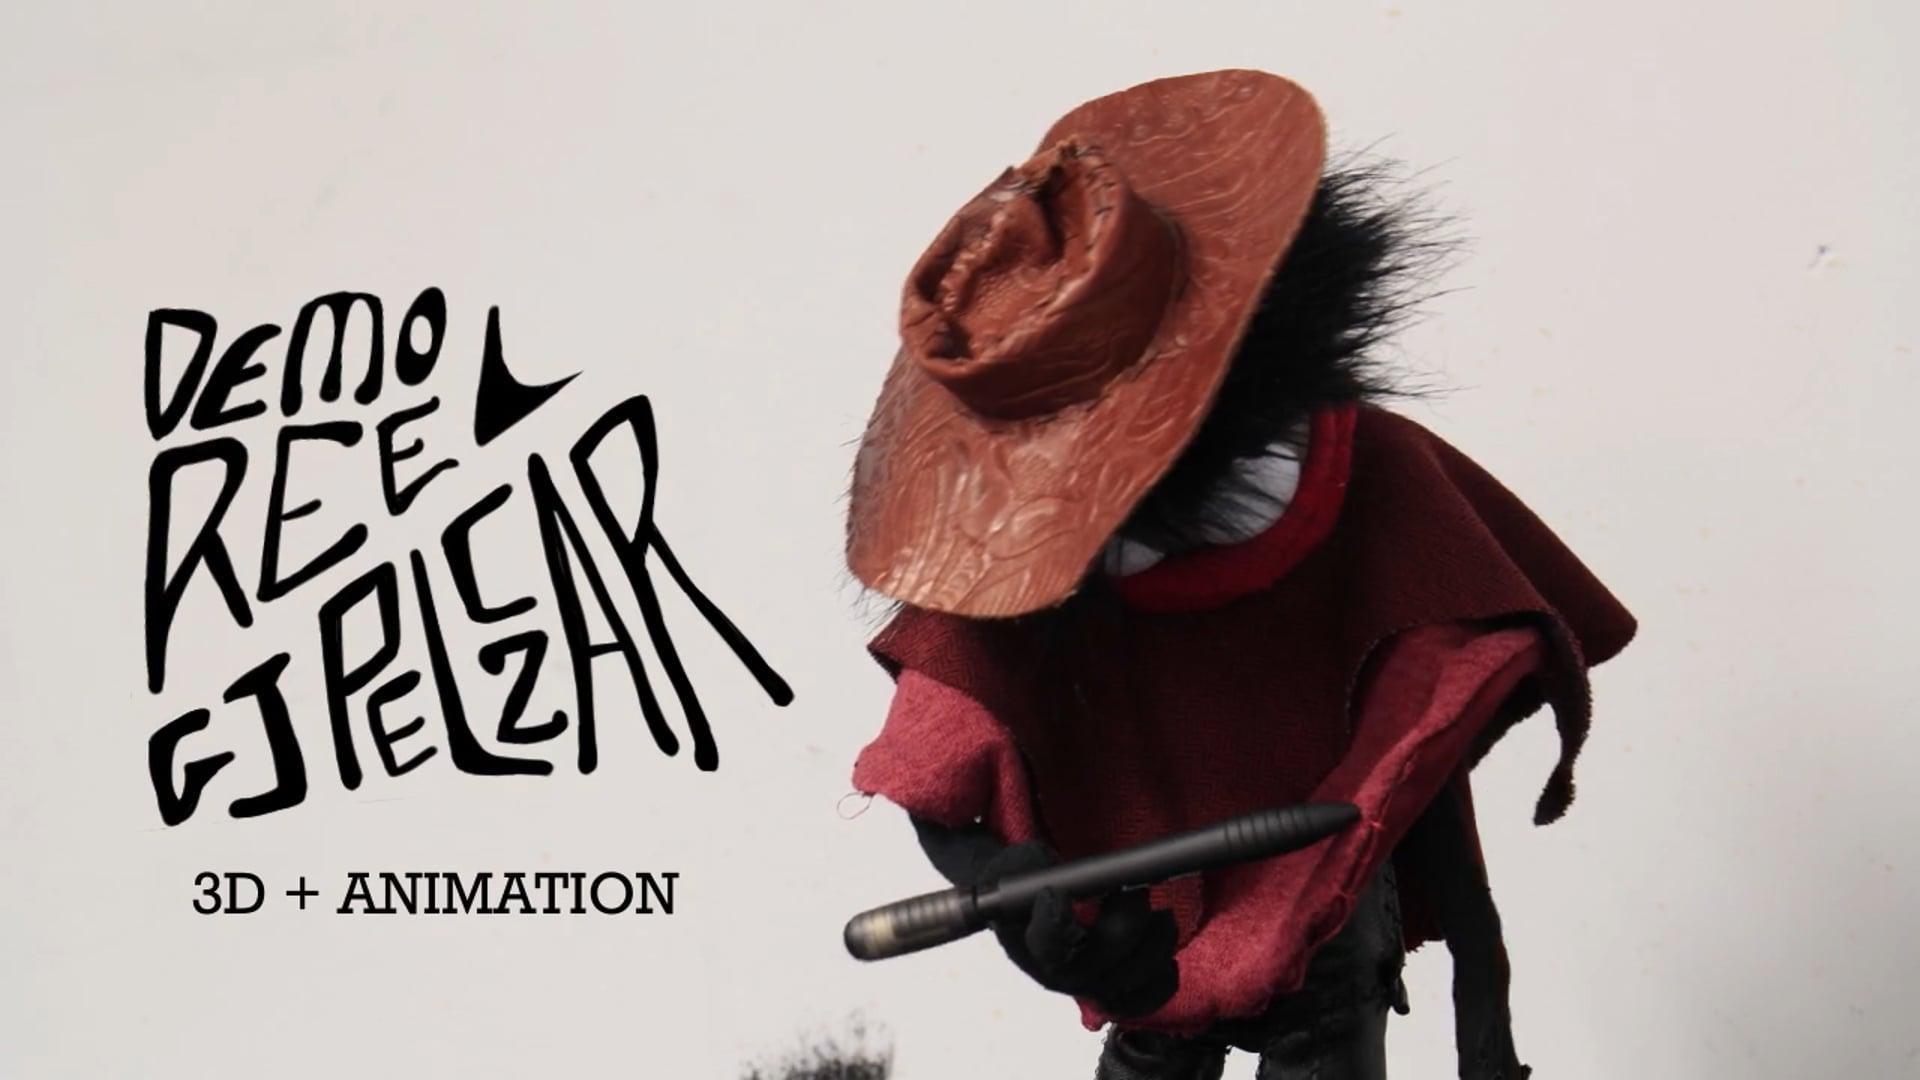 GJ Pelczar 3D + Animation Reel 2020